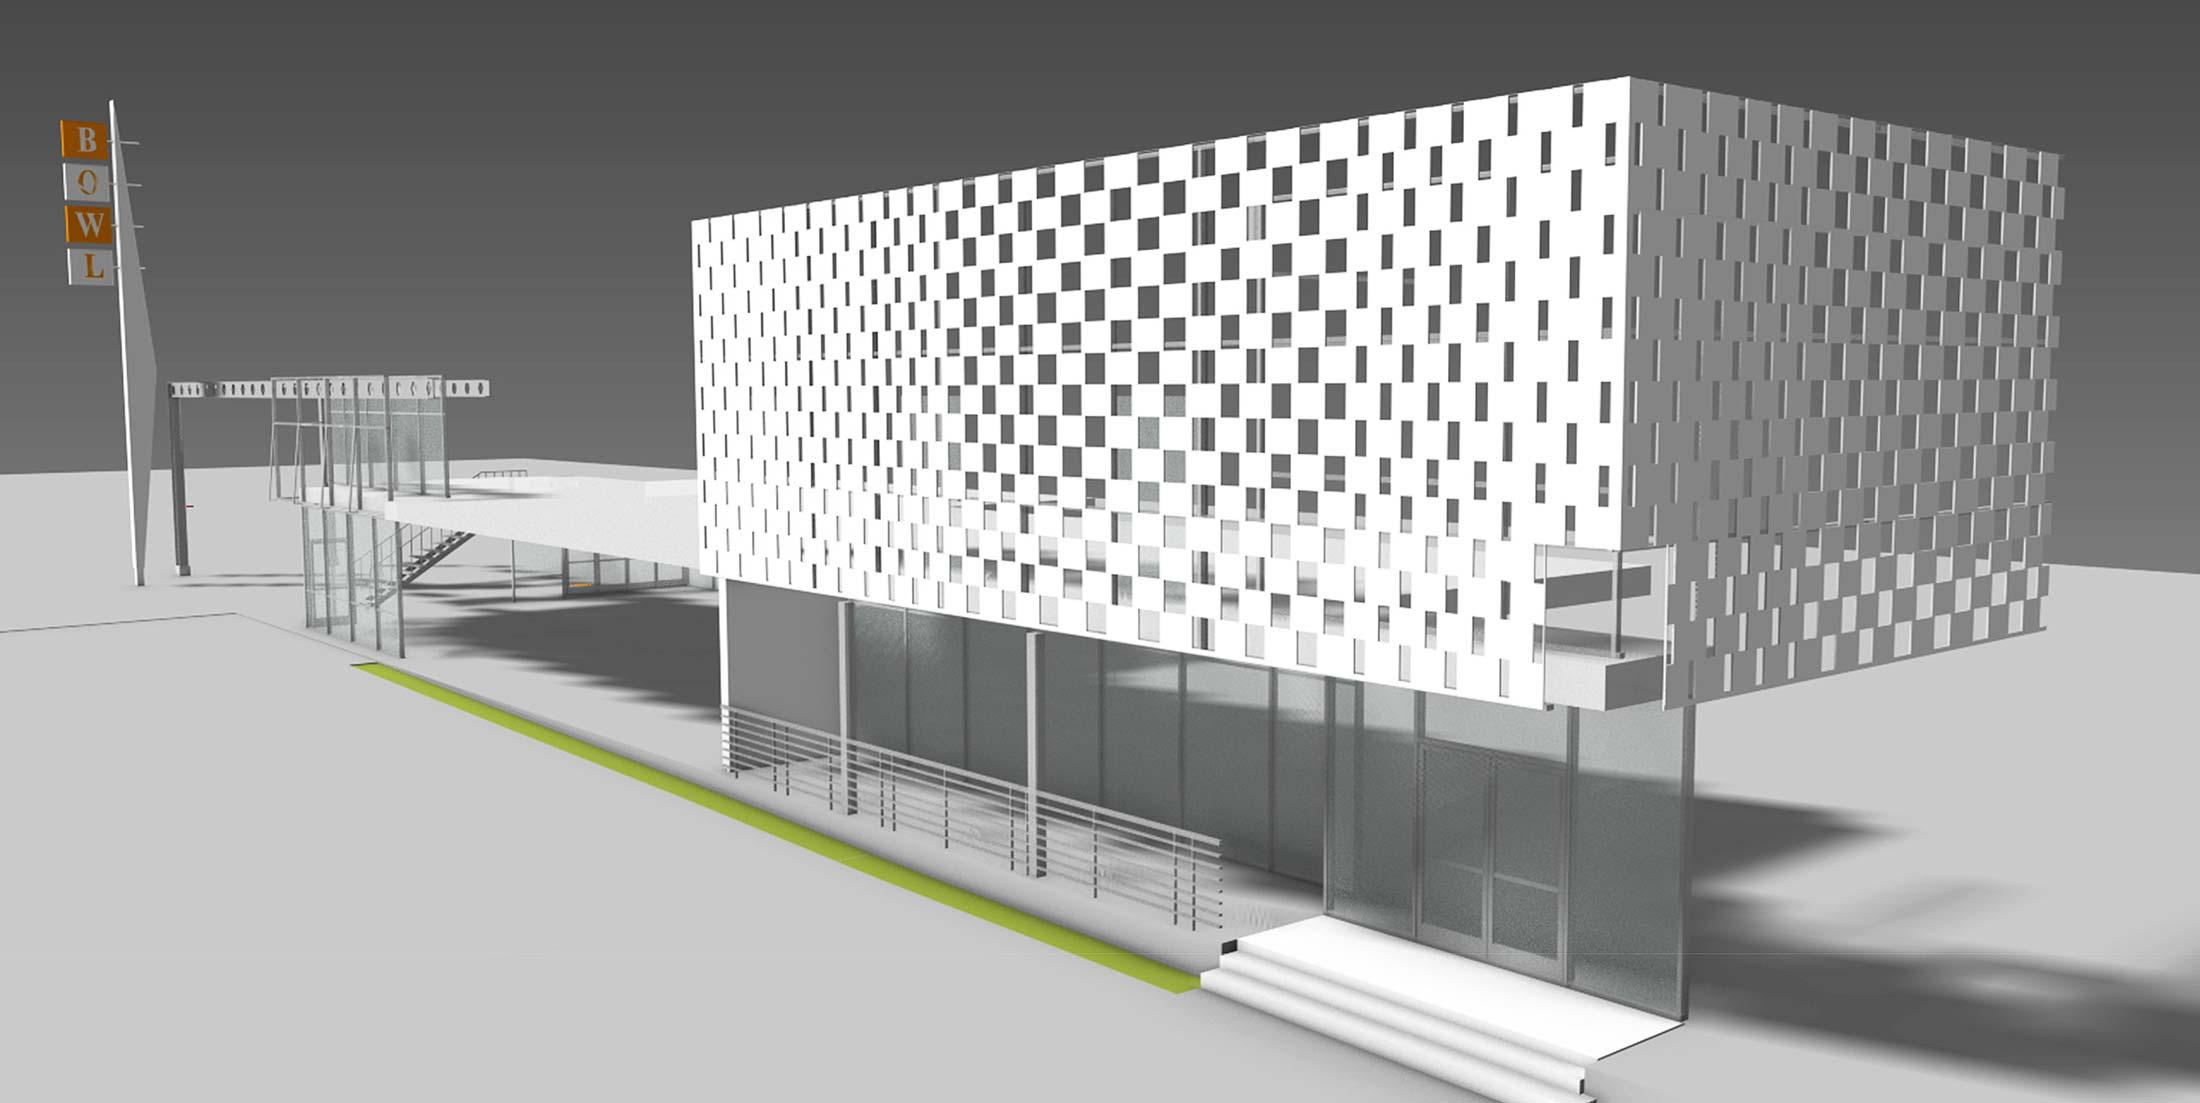 modern-architecture-commercial-building-california-shubindonaldson-picobowl-01